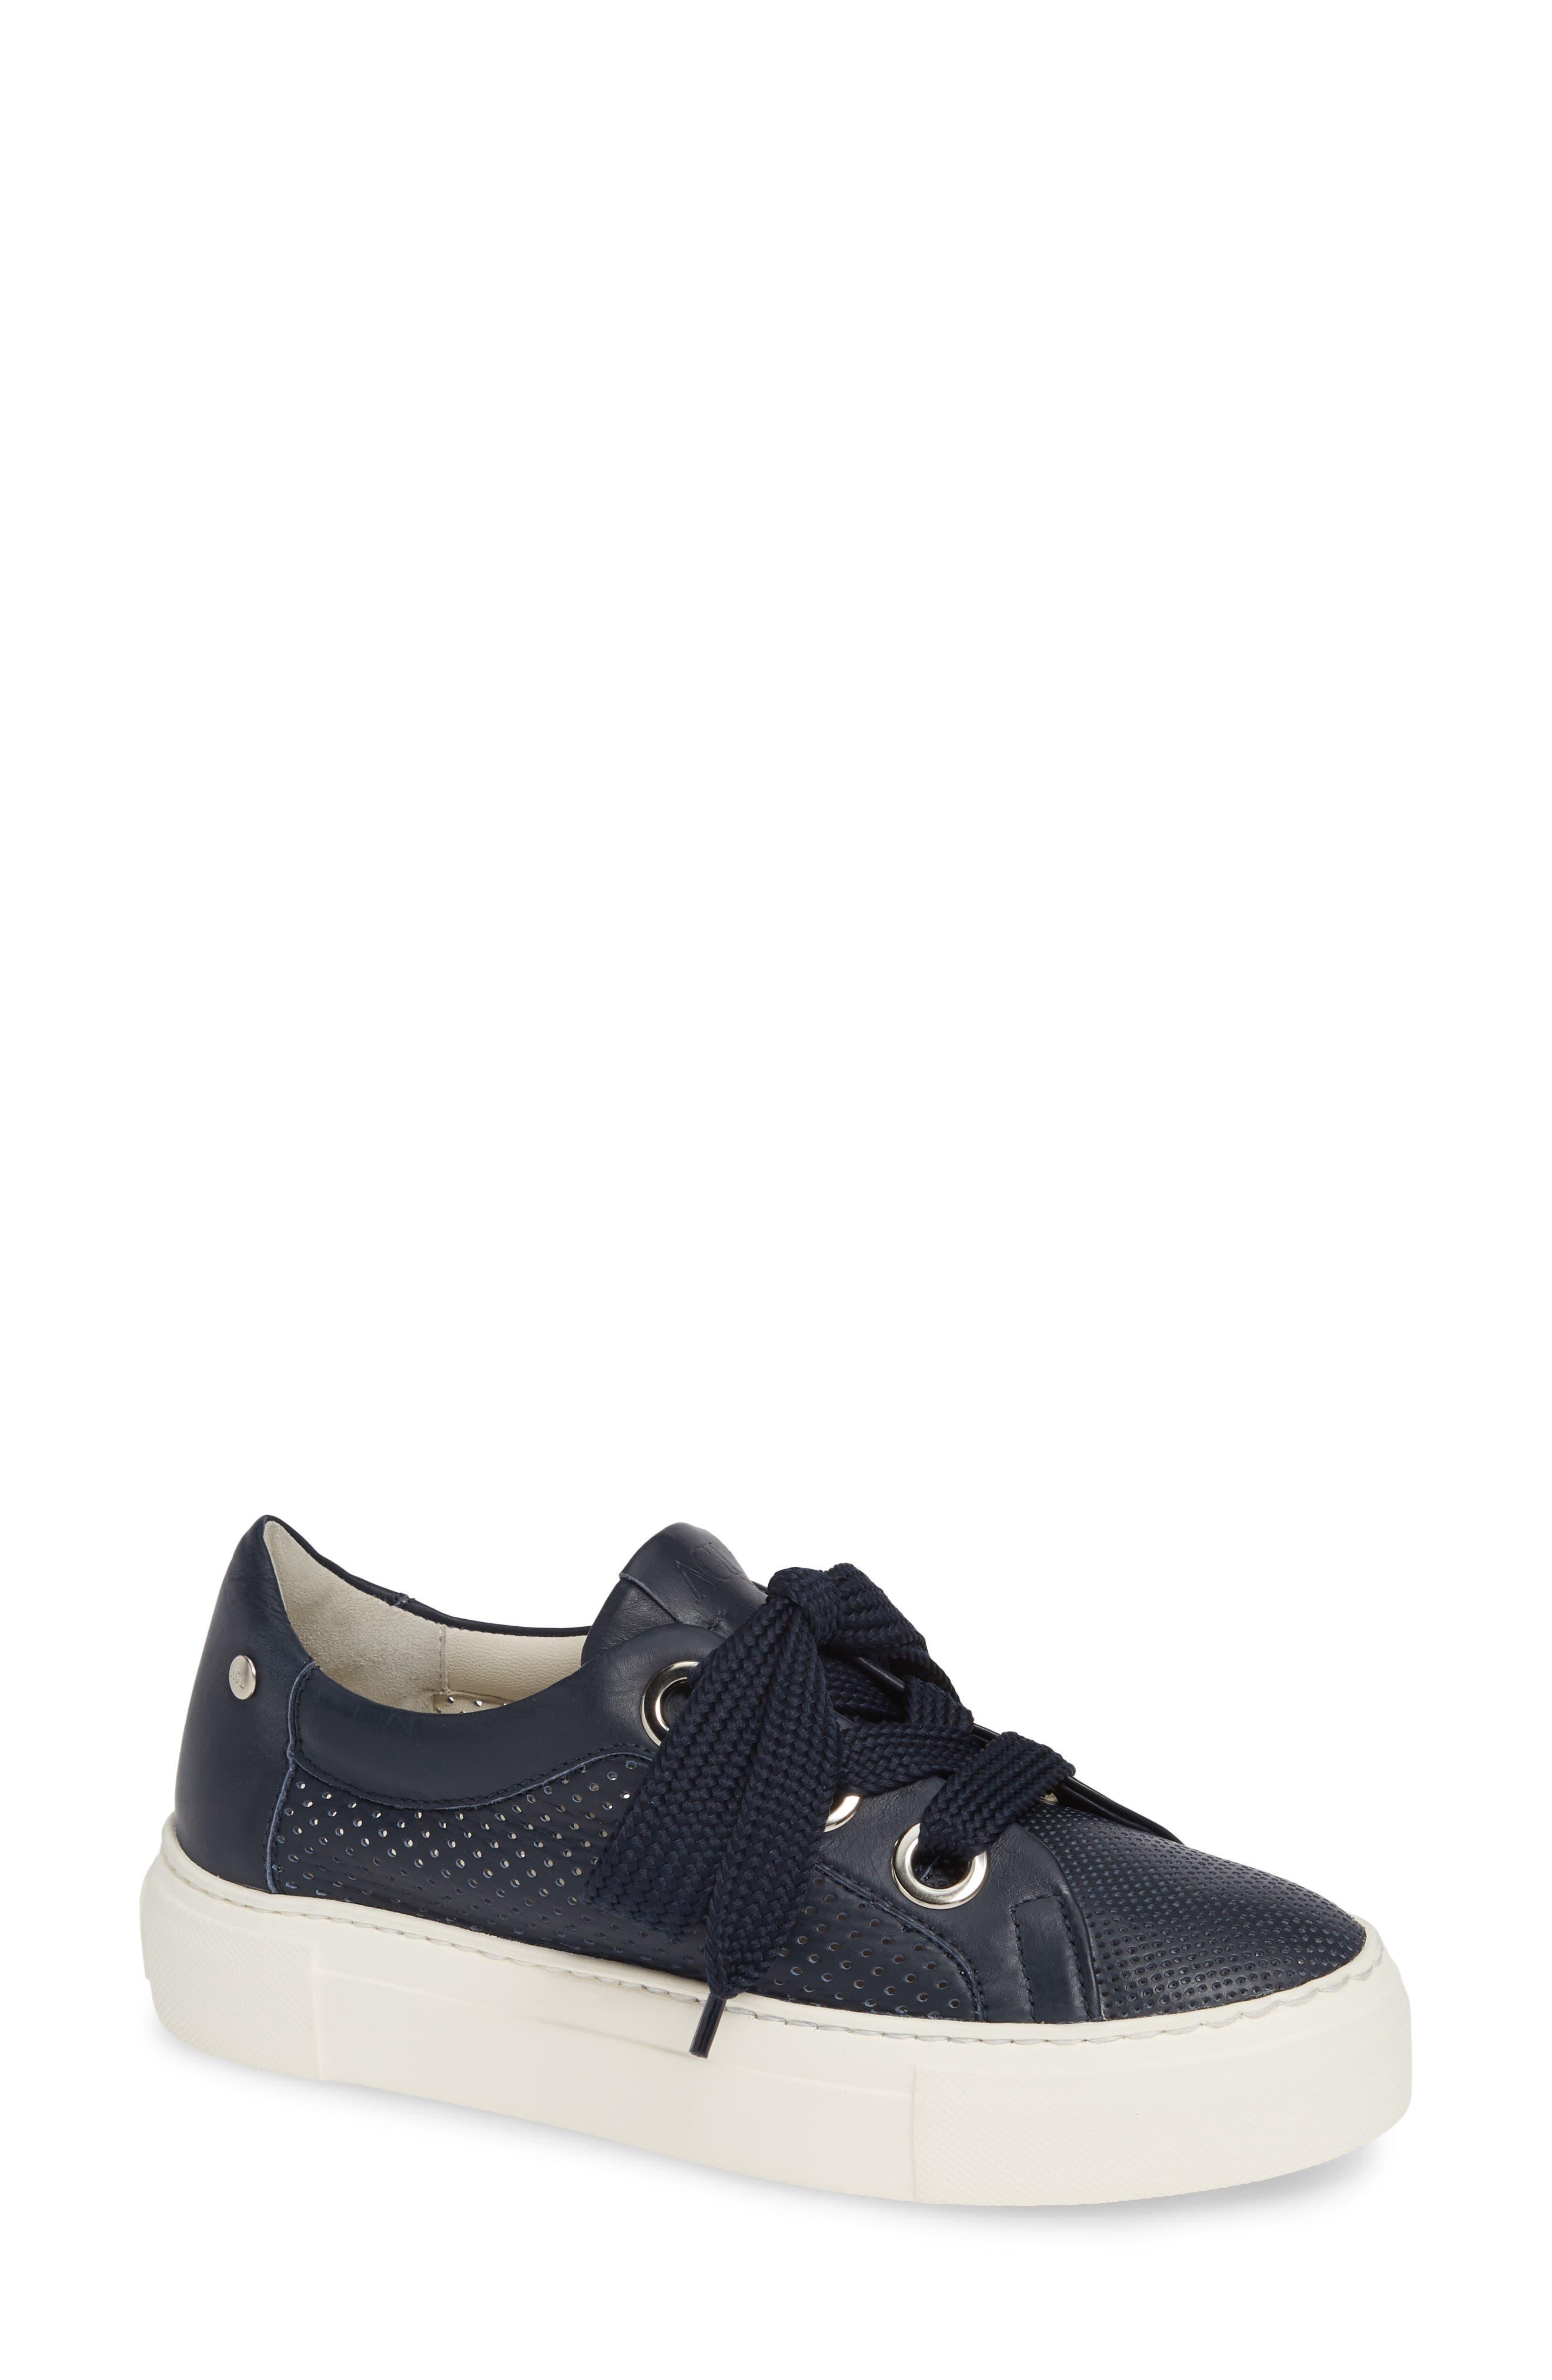 AGL ATTILIO GIUSTI LEOMBRUNI Perforated Platform Sneaker in Navy Leather